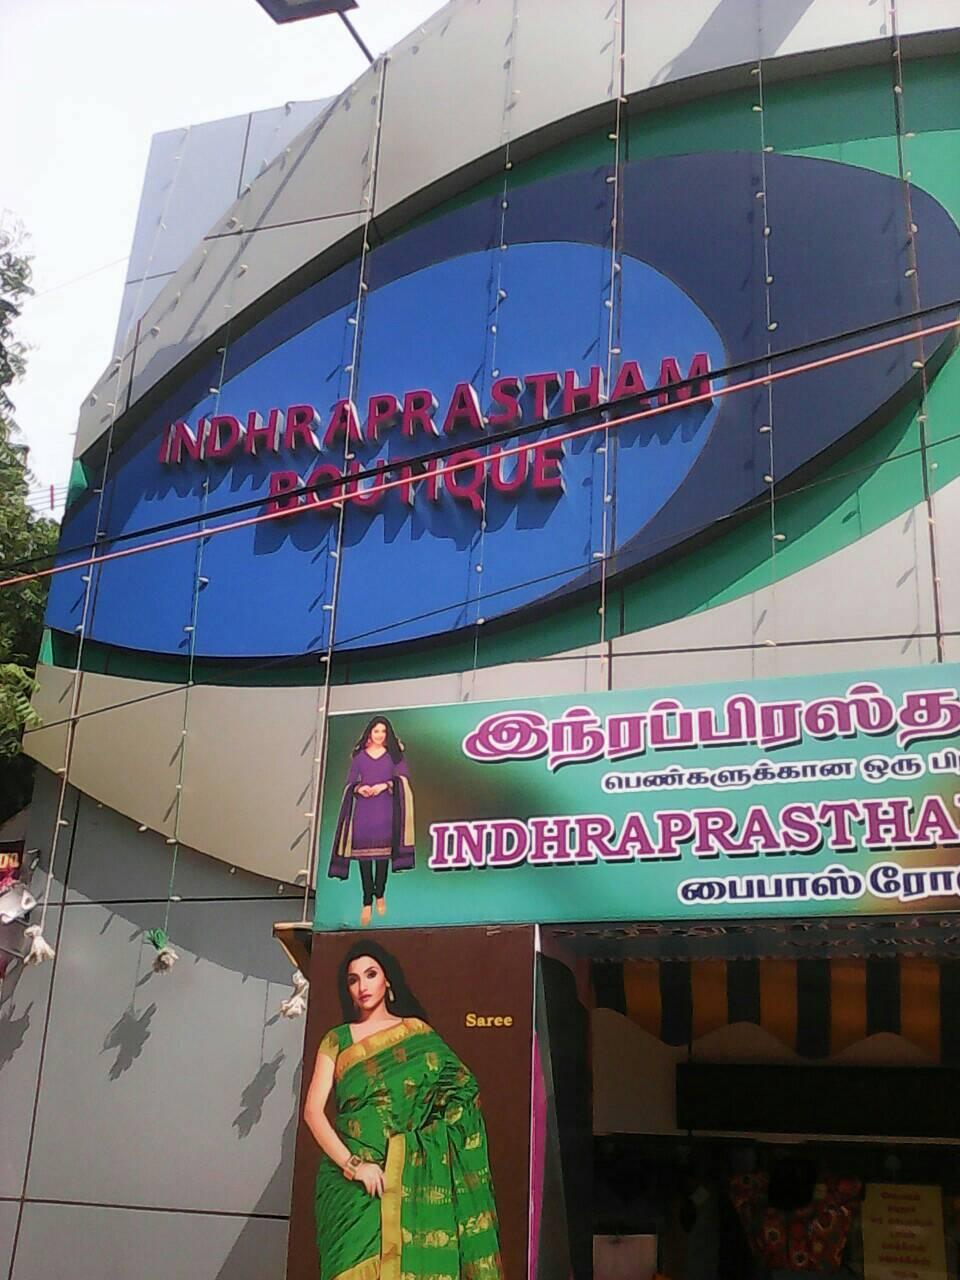 Indraprashtam Boutique